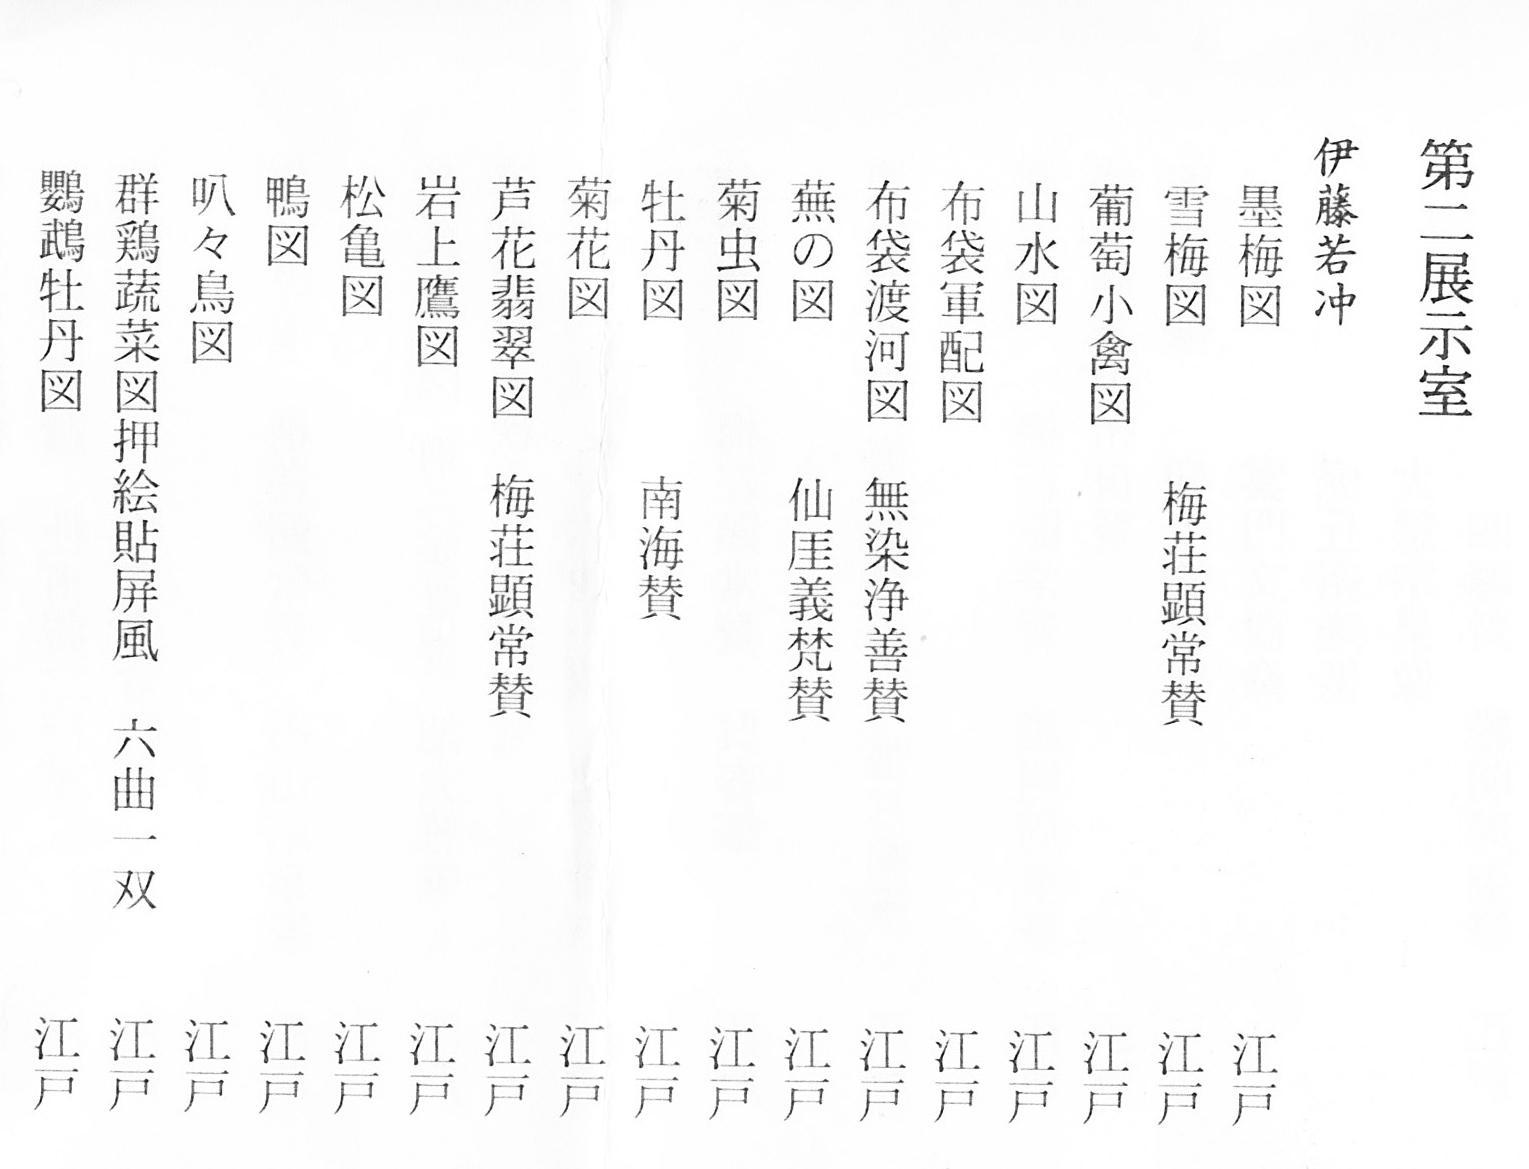 IMG_0001-1.jpg